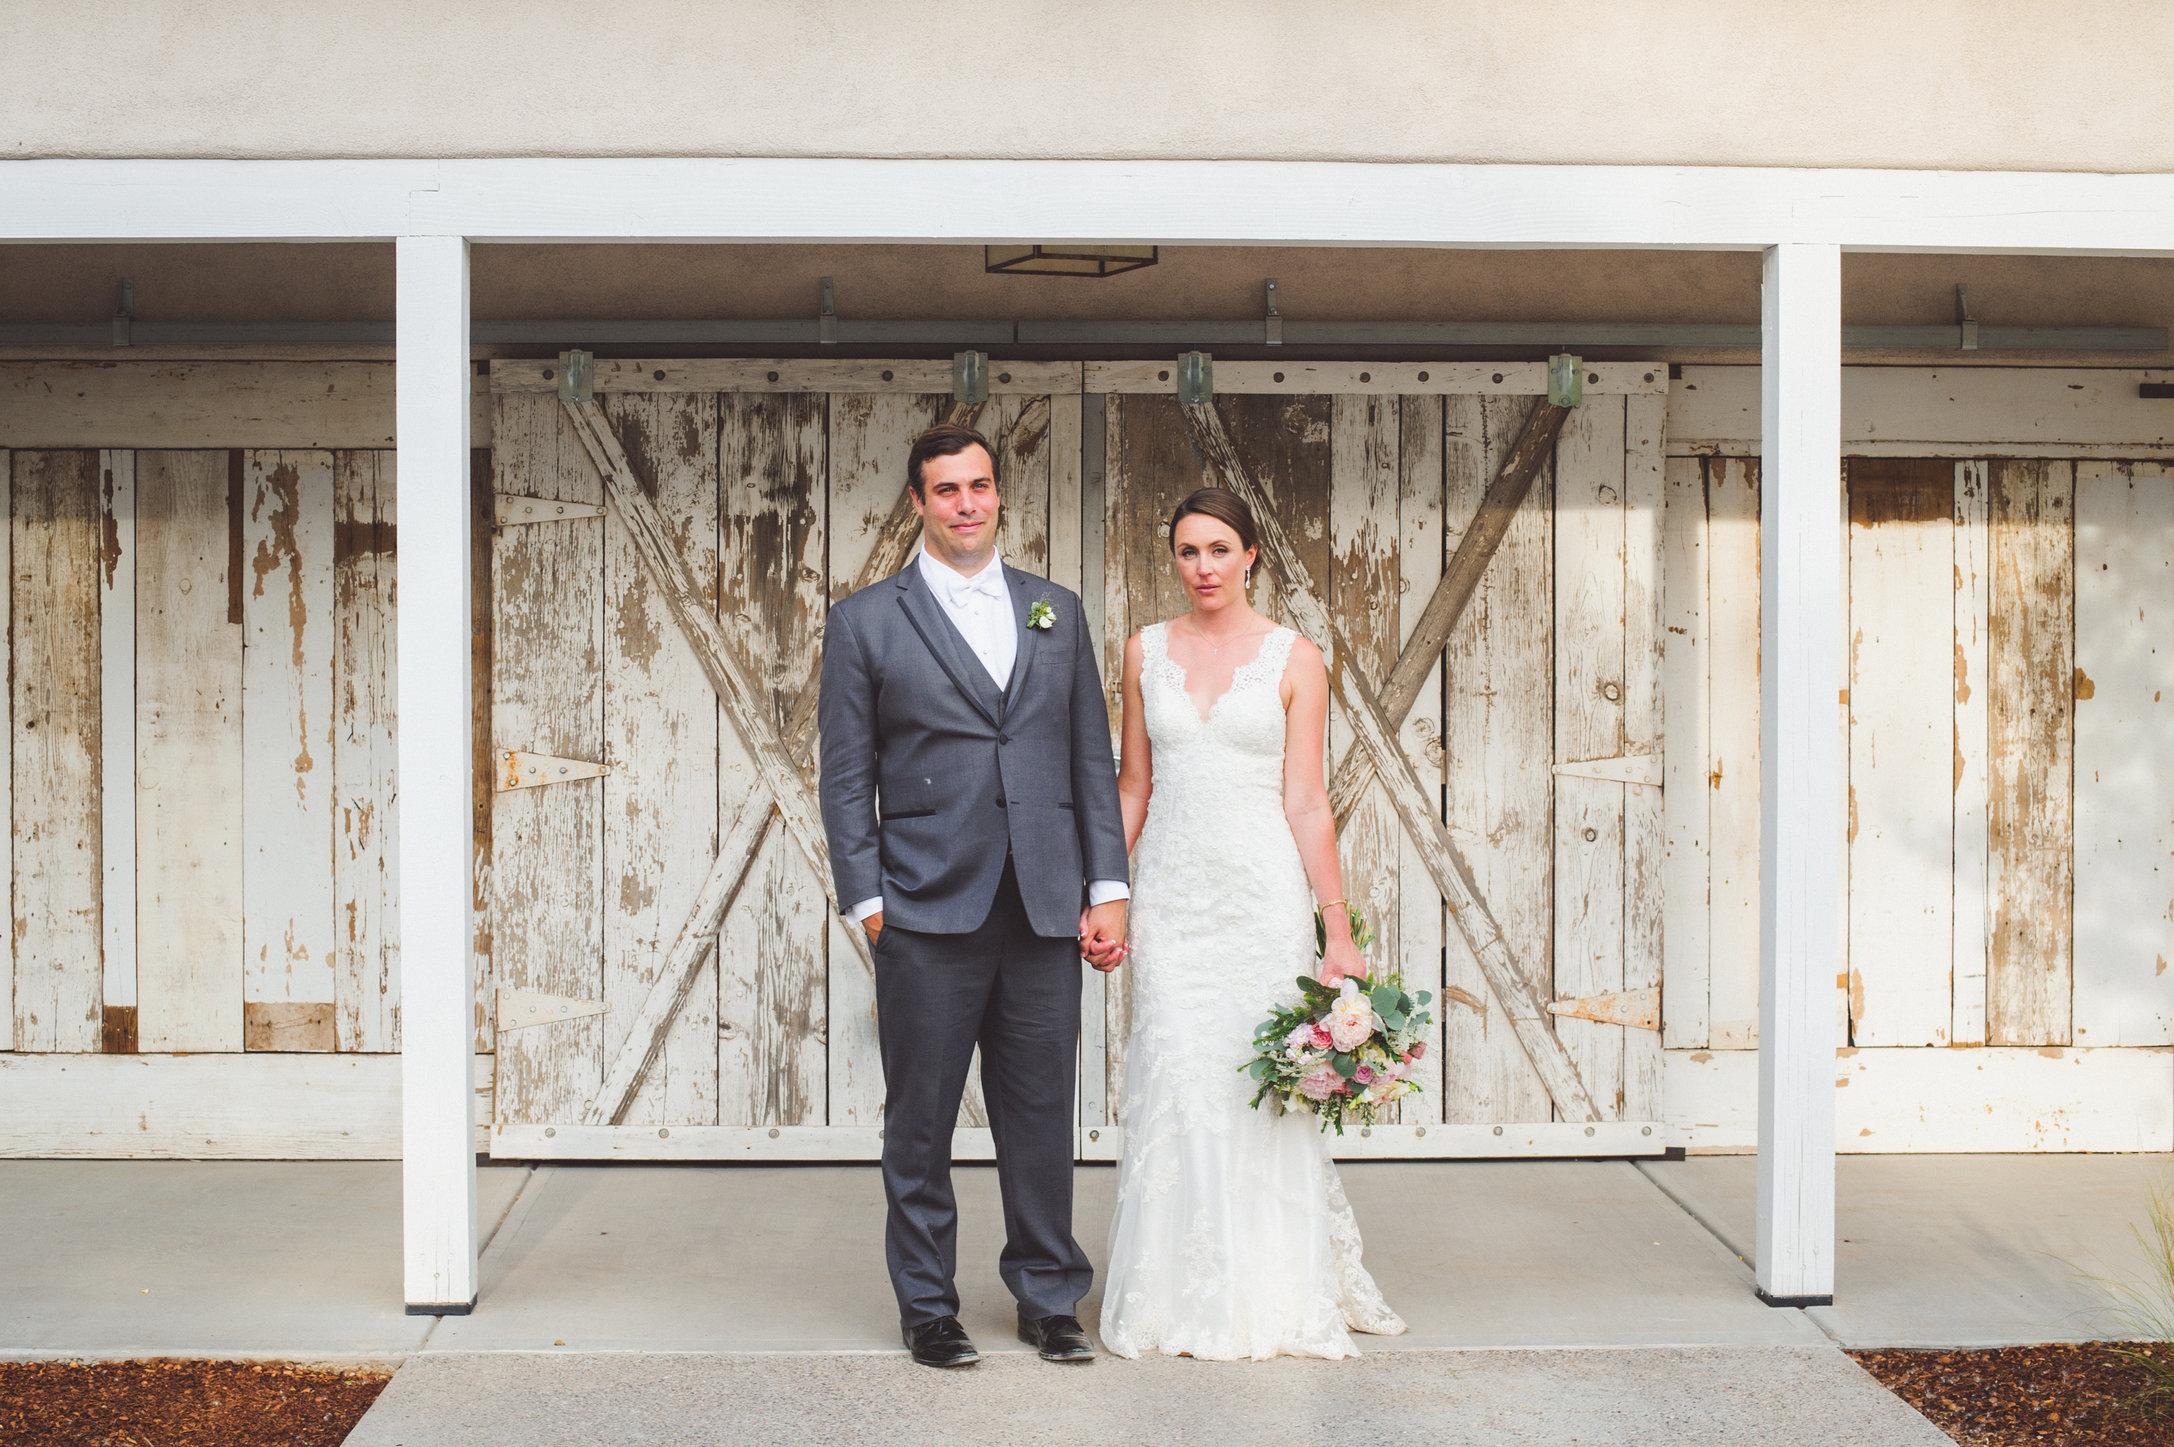 SandC-wedding-568.jpg